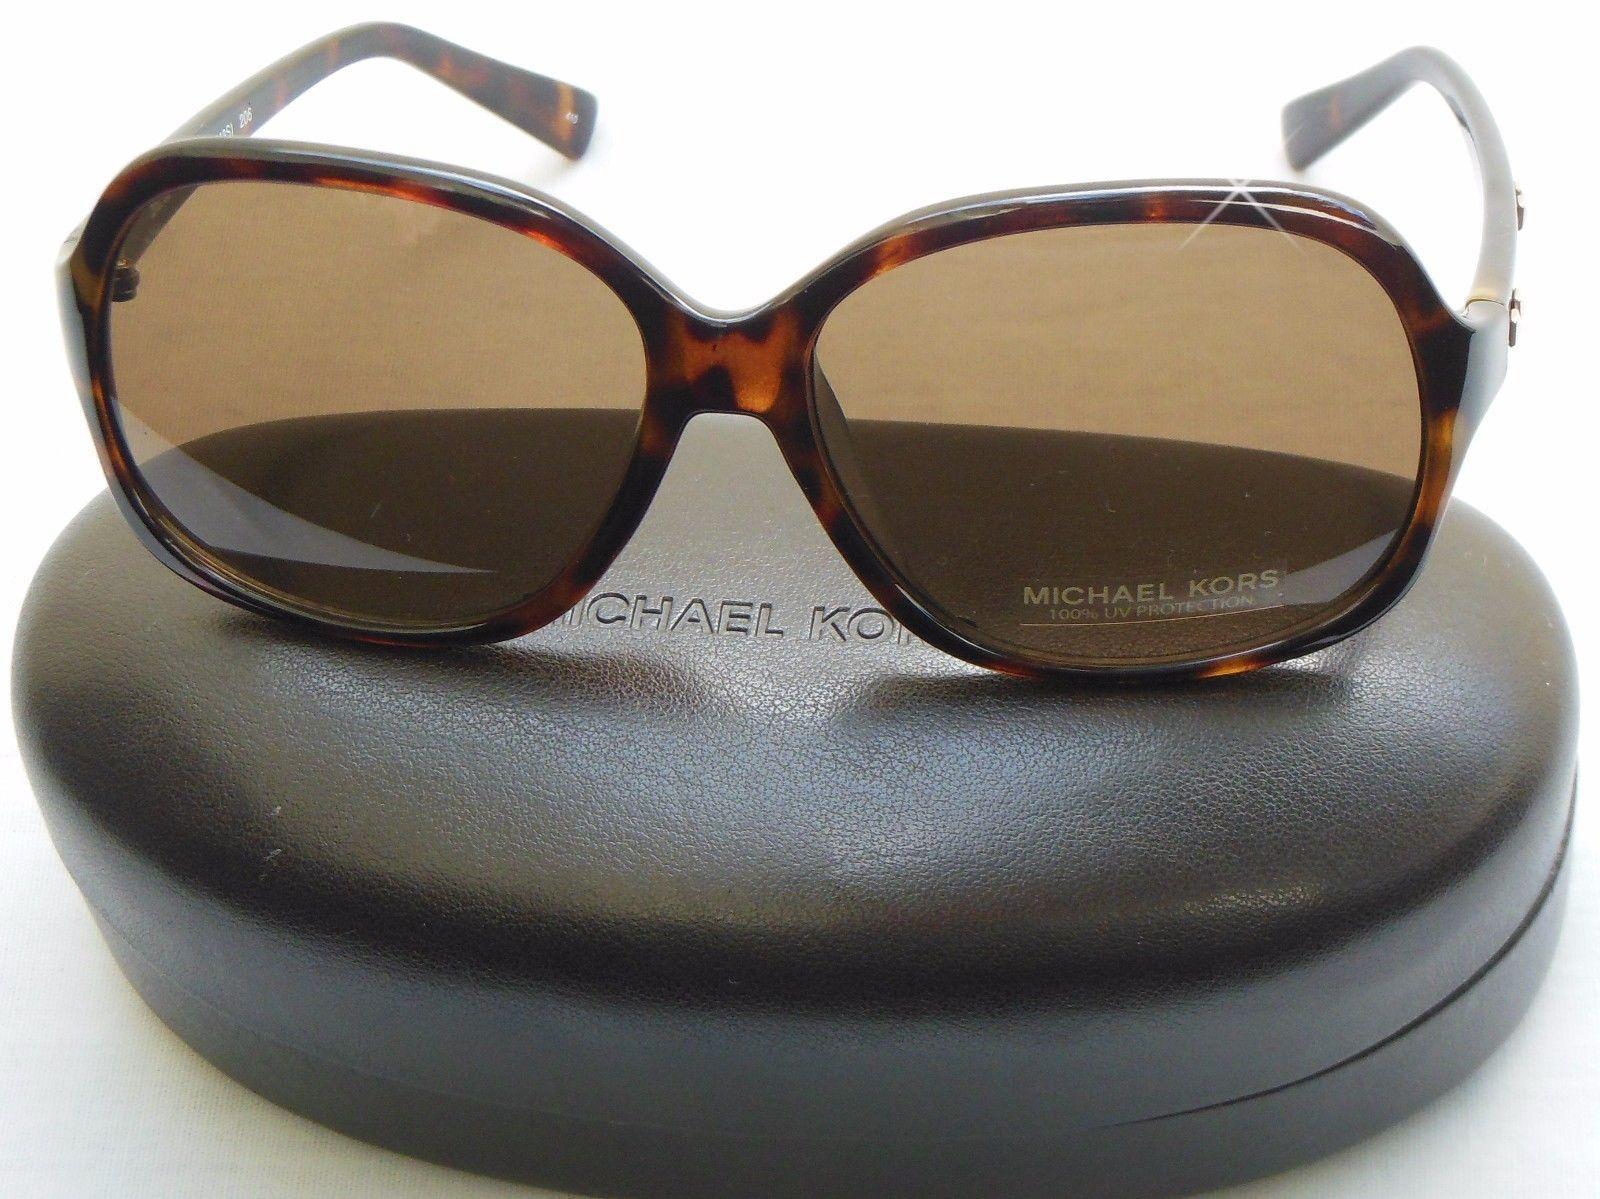 748bf59b95 NEW Michael Kors M2743S Palo Alto Studded Sunglasses Dark Tortoise W Case